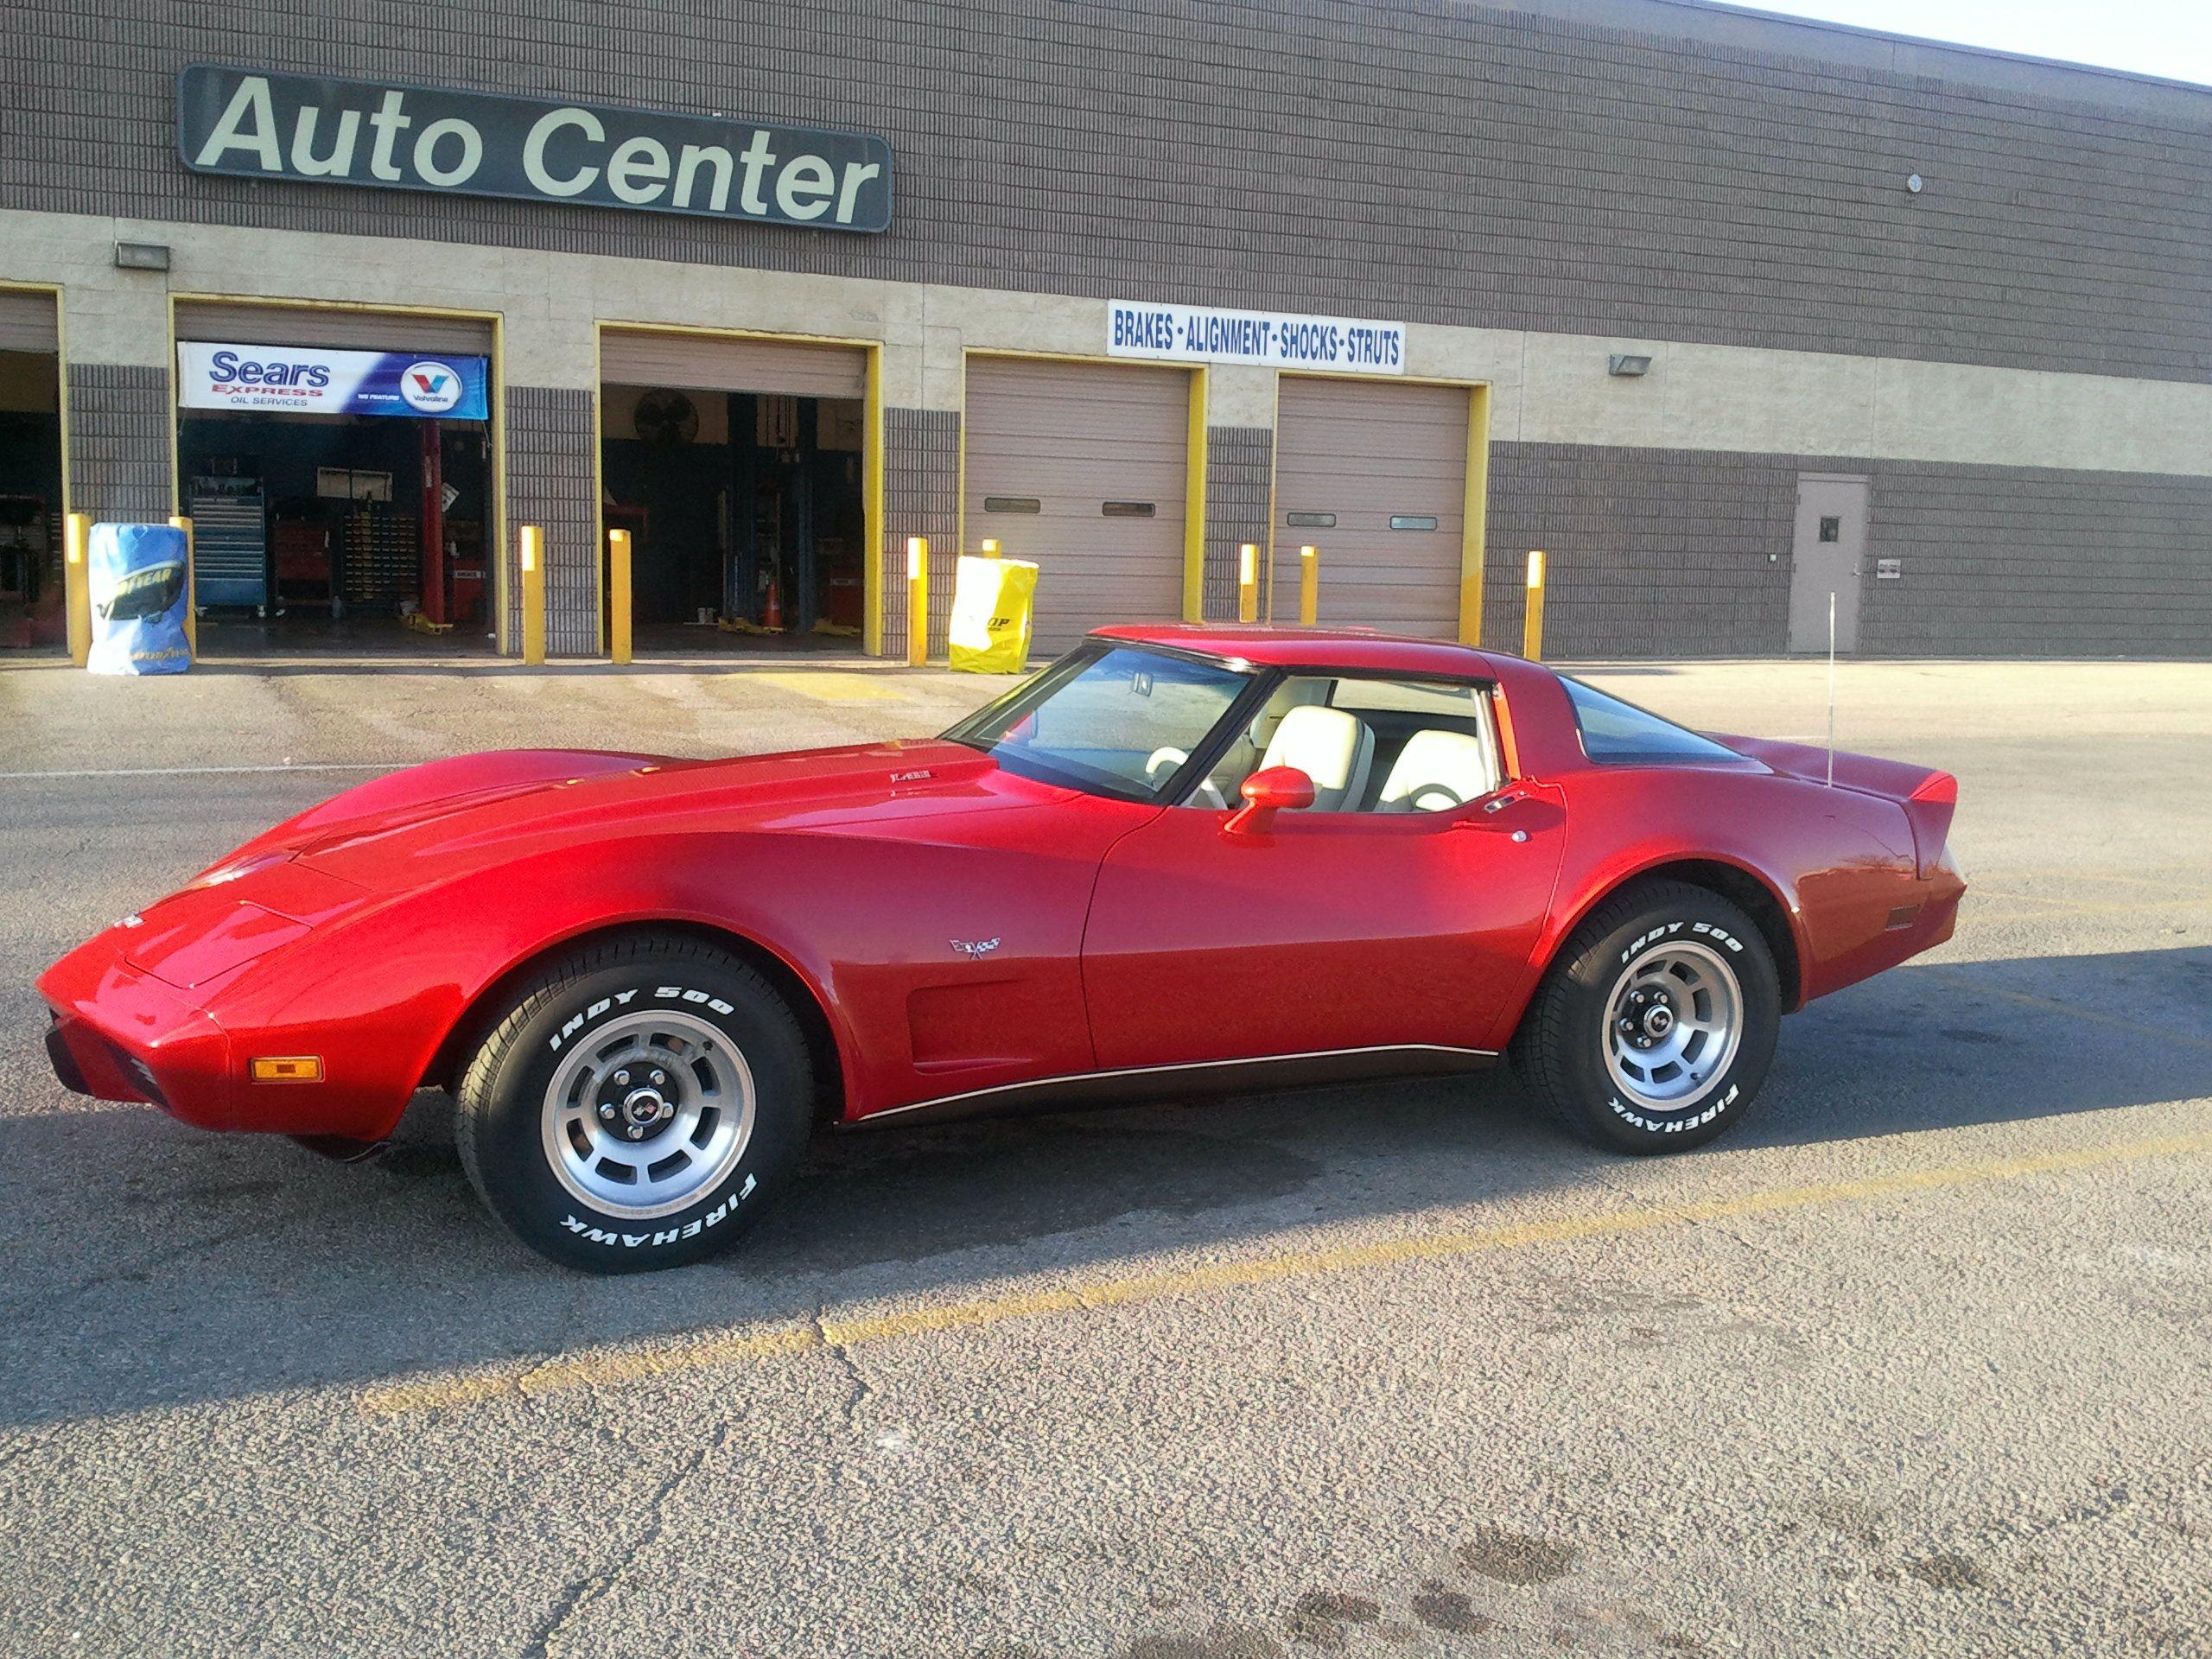 1979 Corvette Yum Red Corvette Corvette Classic Chevrolet